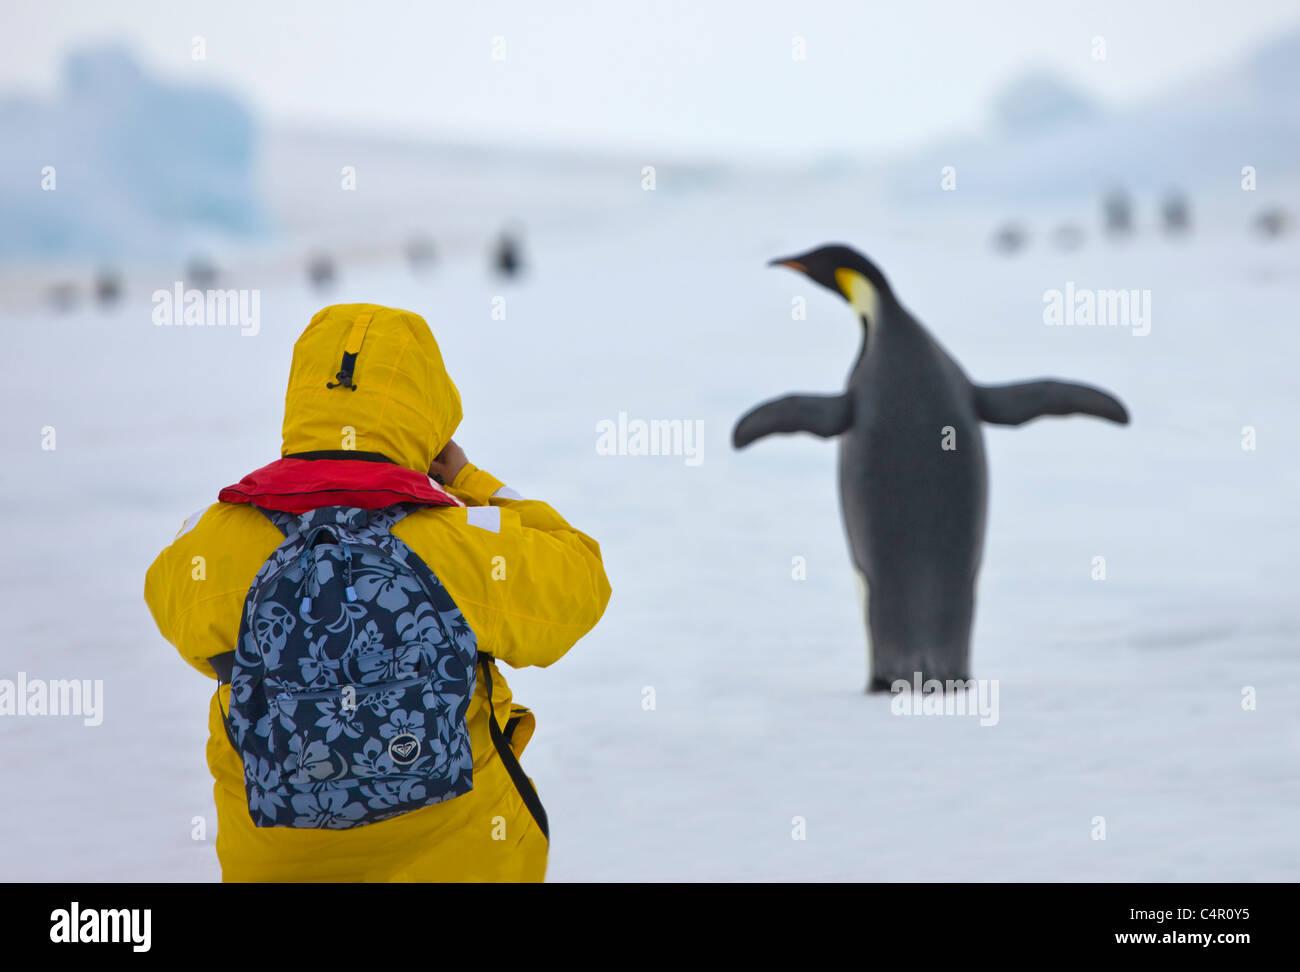 Touristen fotografieren Kaiserpinguin auf Eis, Snow Hill Island, Antarktis Stockbild